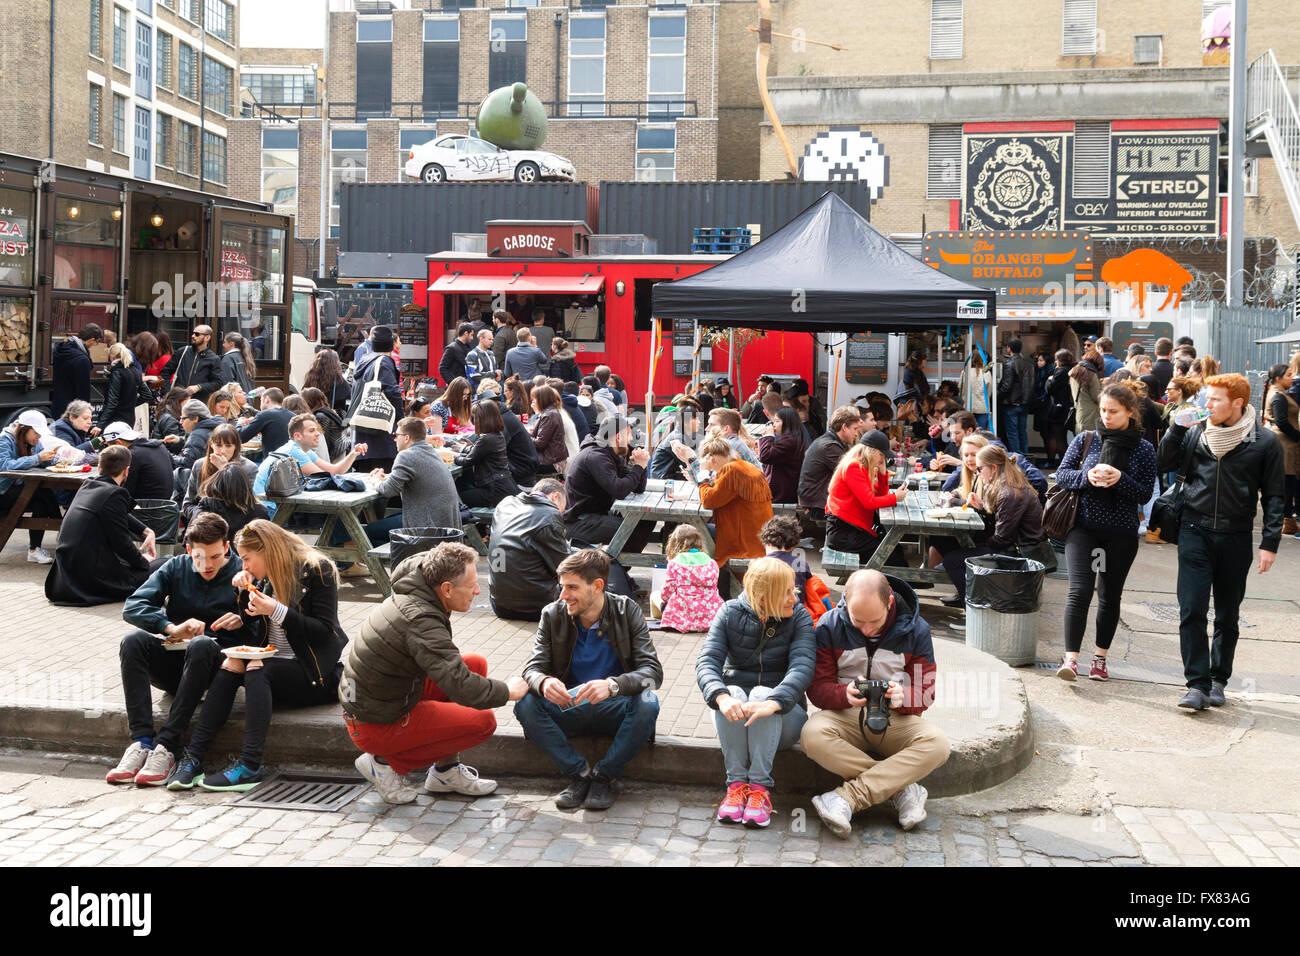 People sitting in the street, Brick Lane Sunday Upmarket, Spitalfields, London East End, UK - Stock Image